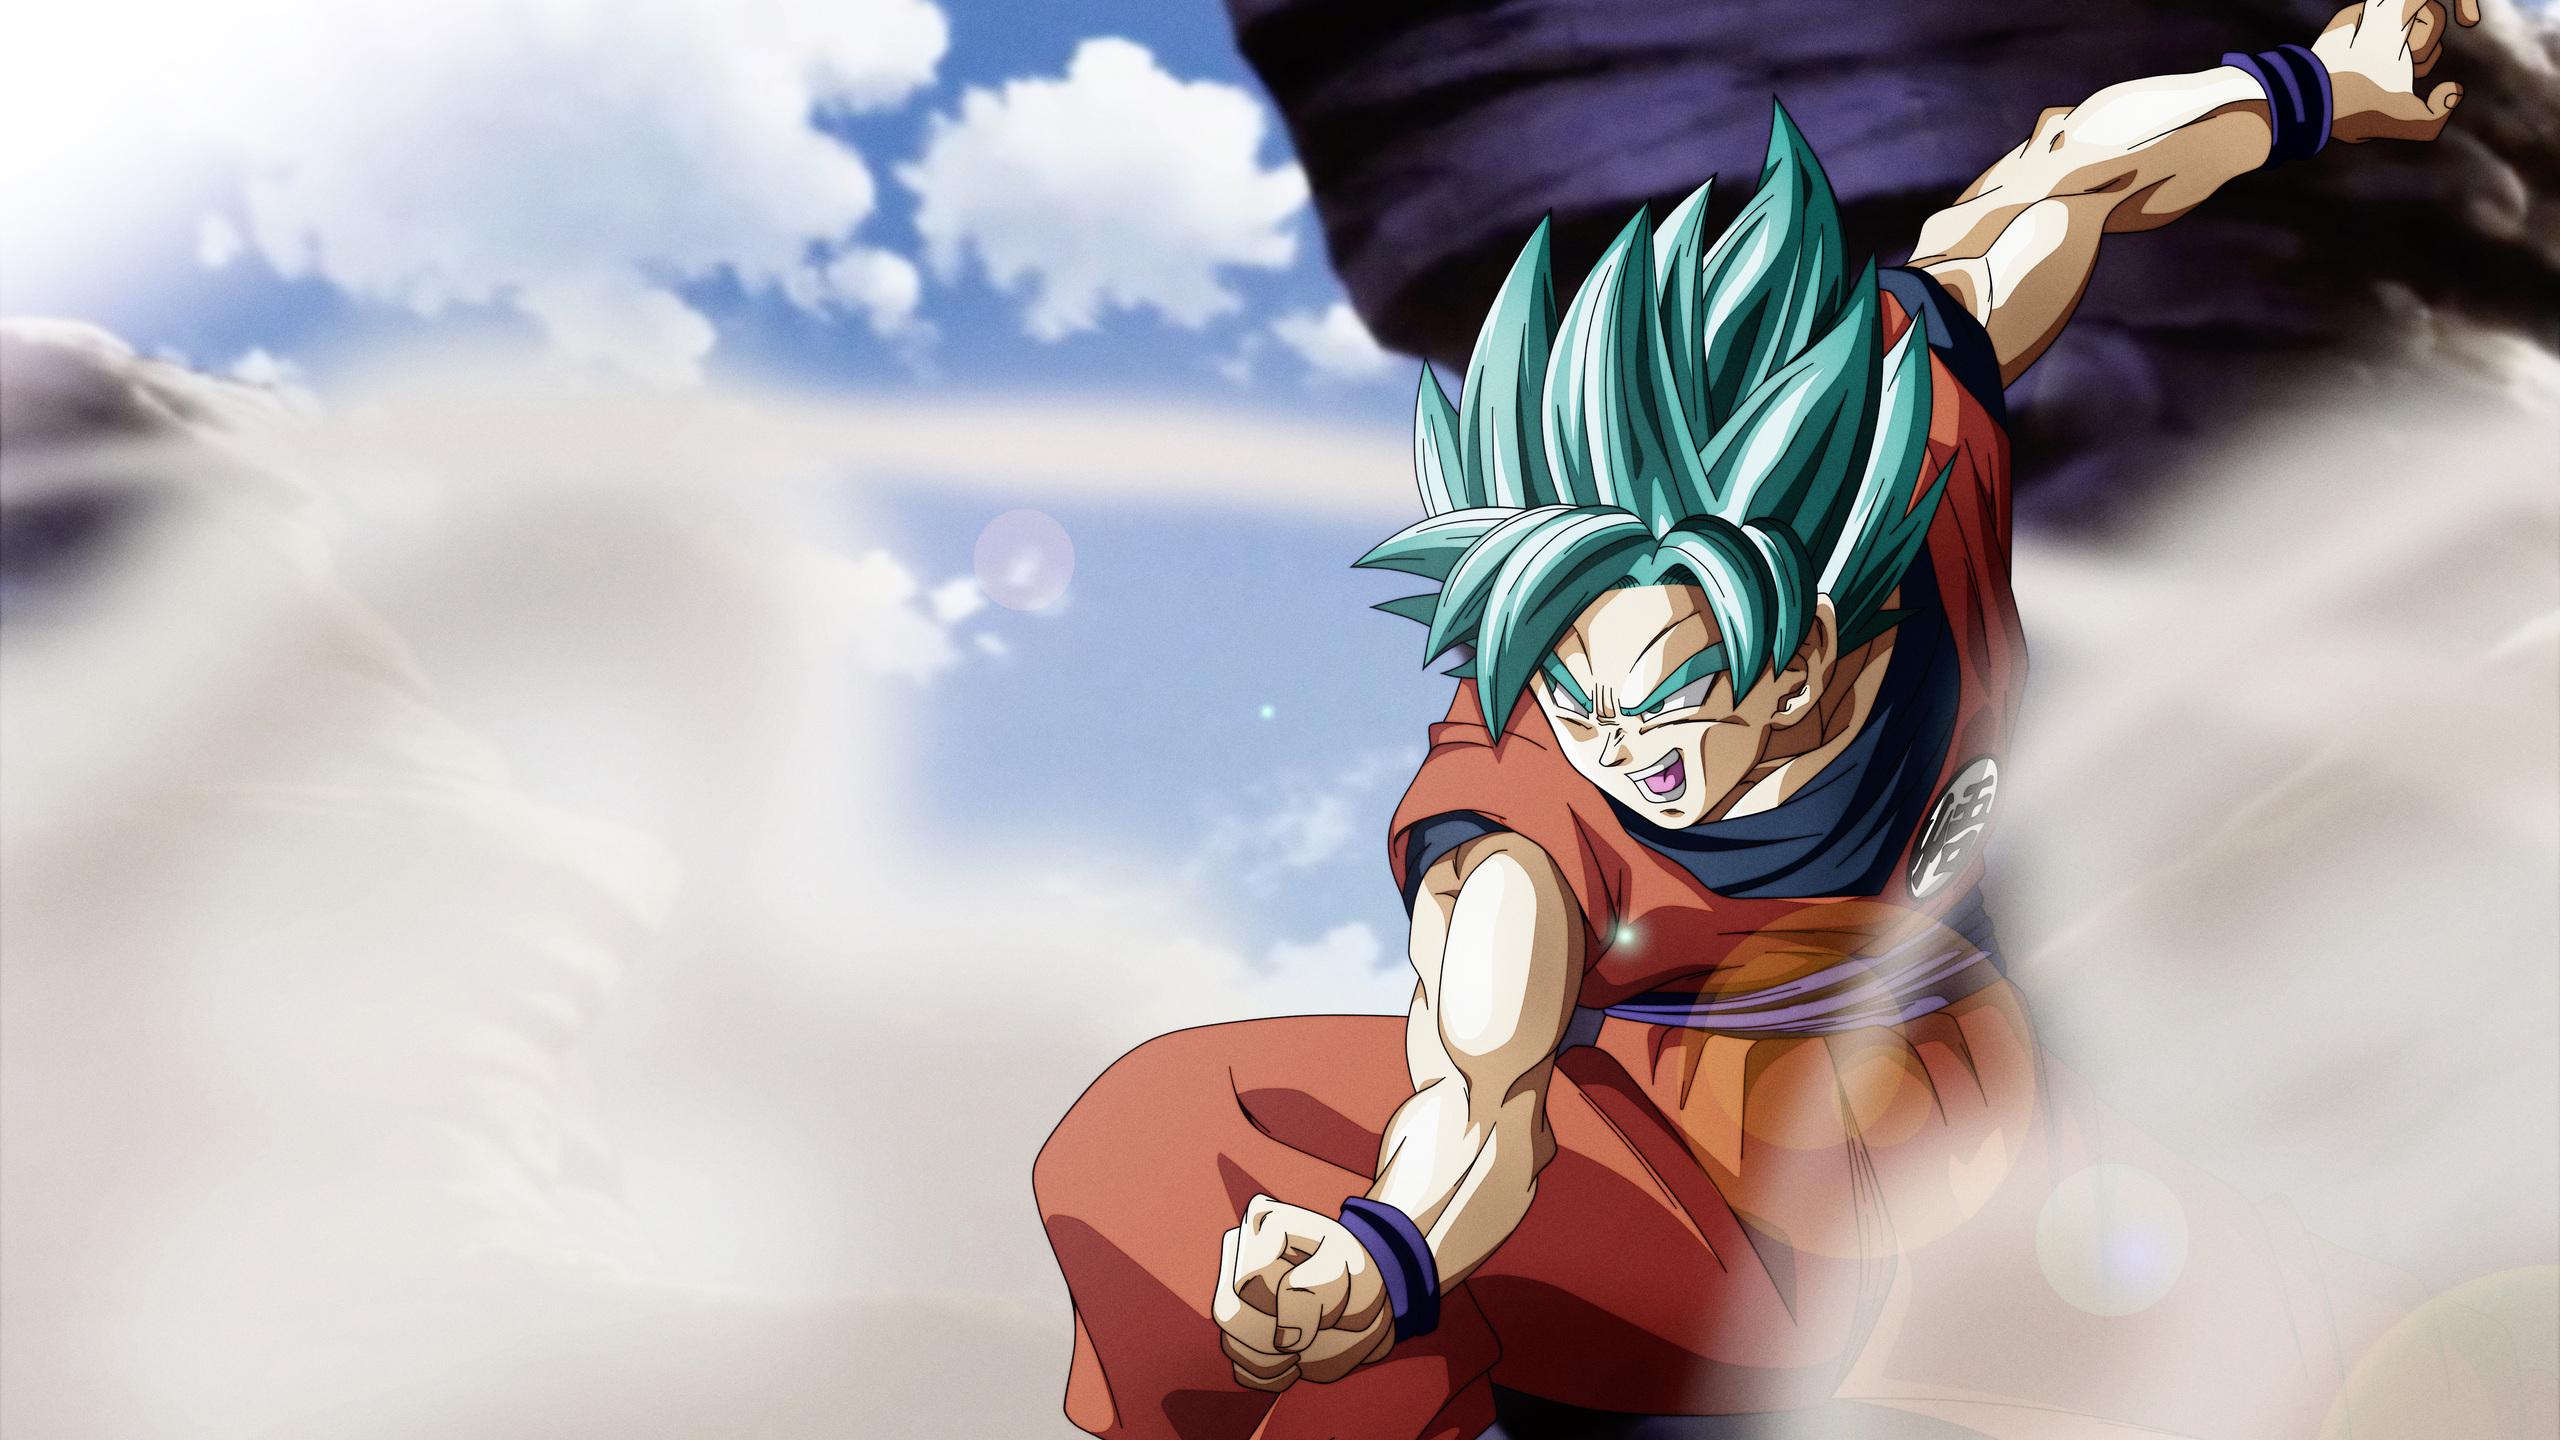 2560x1440 Goku Super Saiyan Blue 1440p Resolution Hd 4k